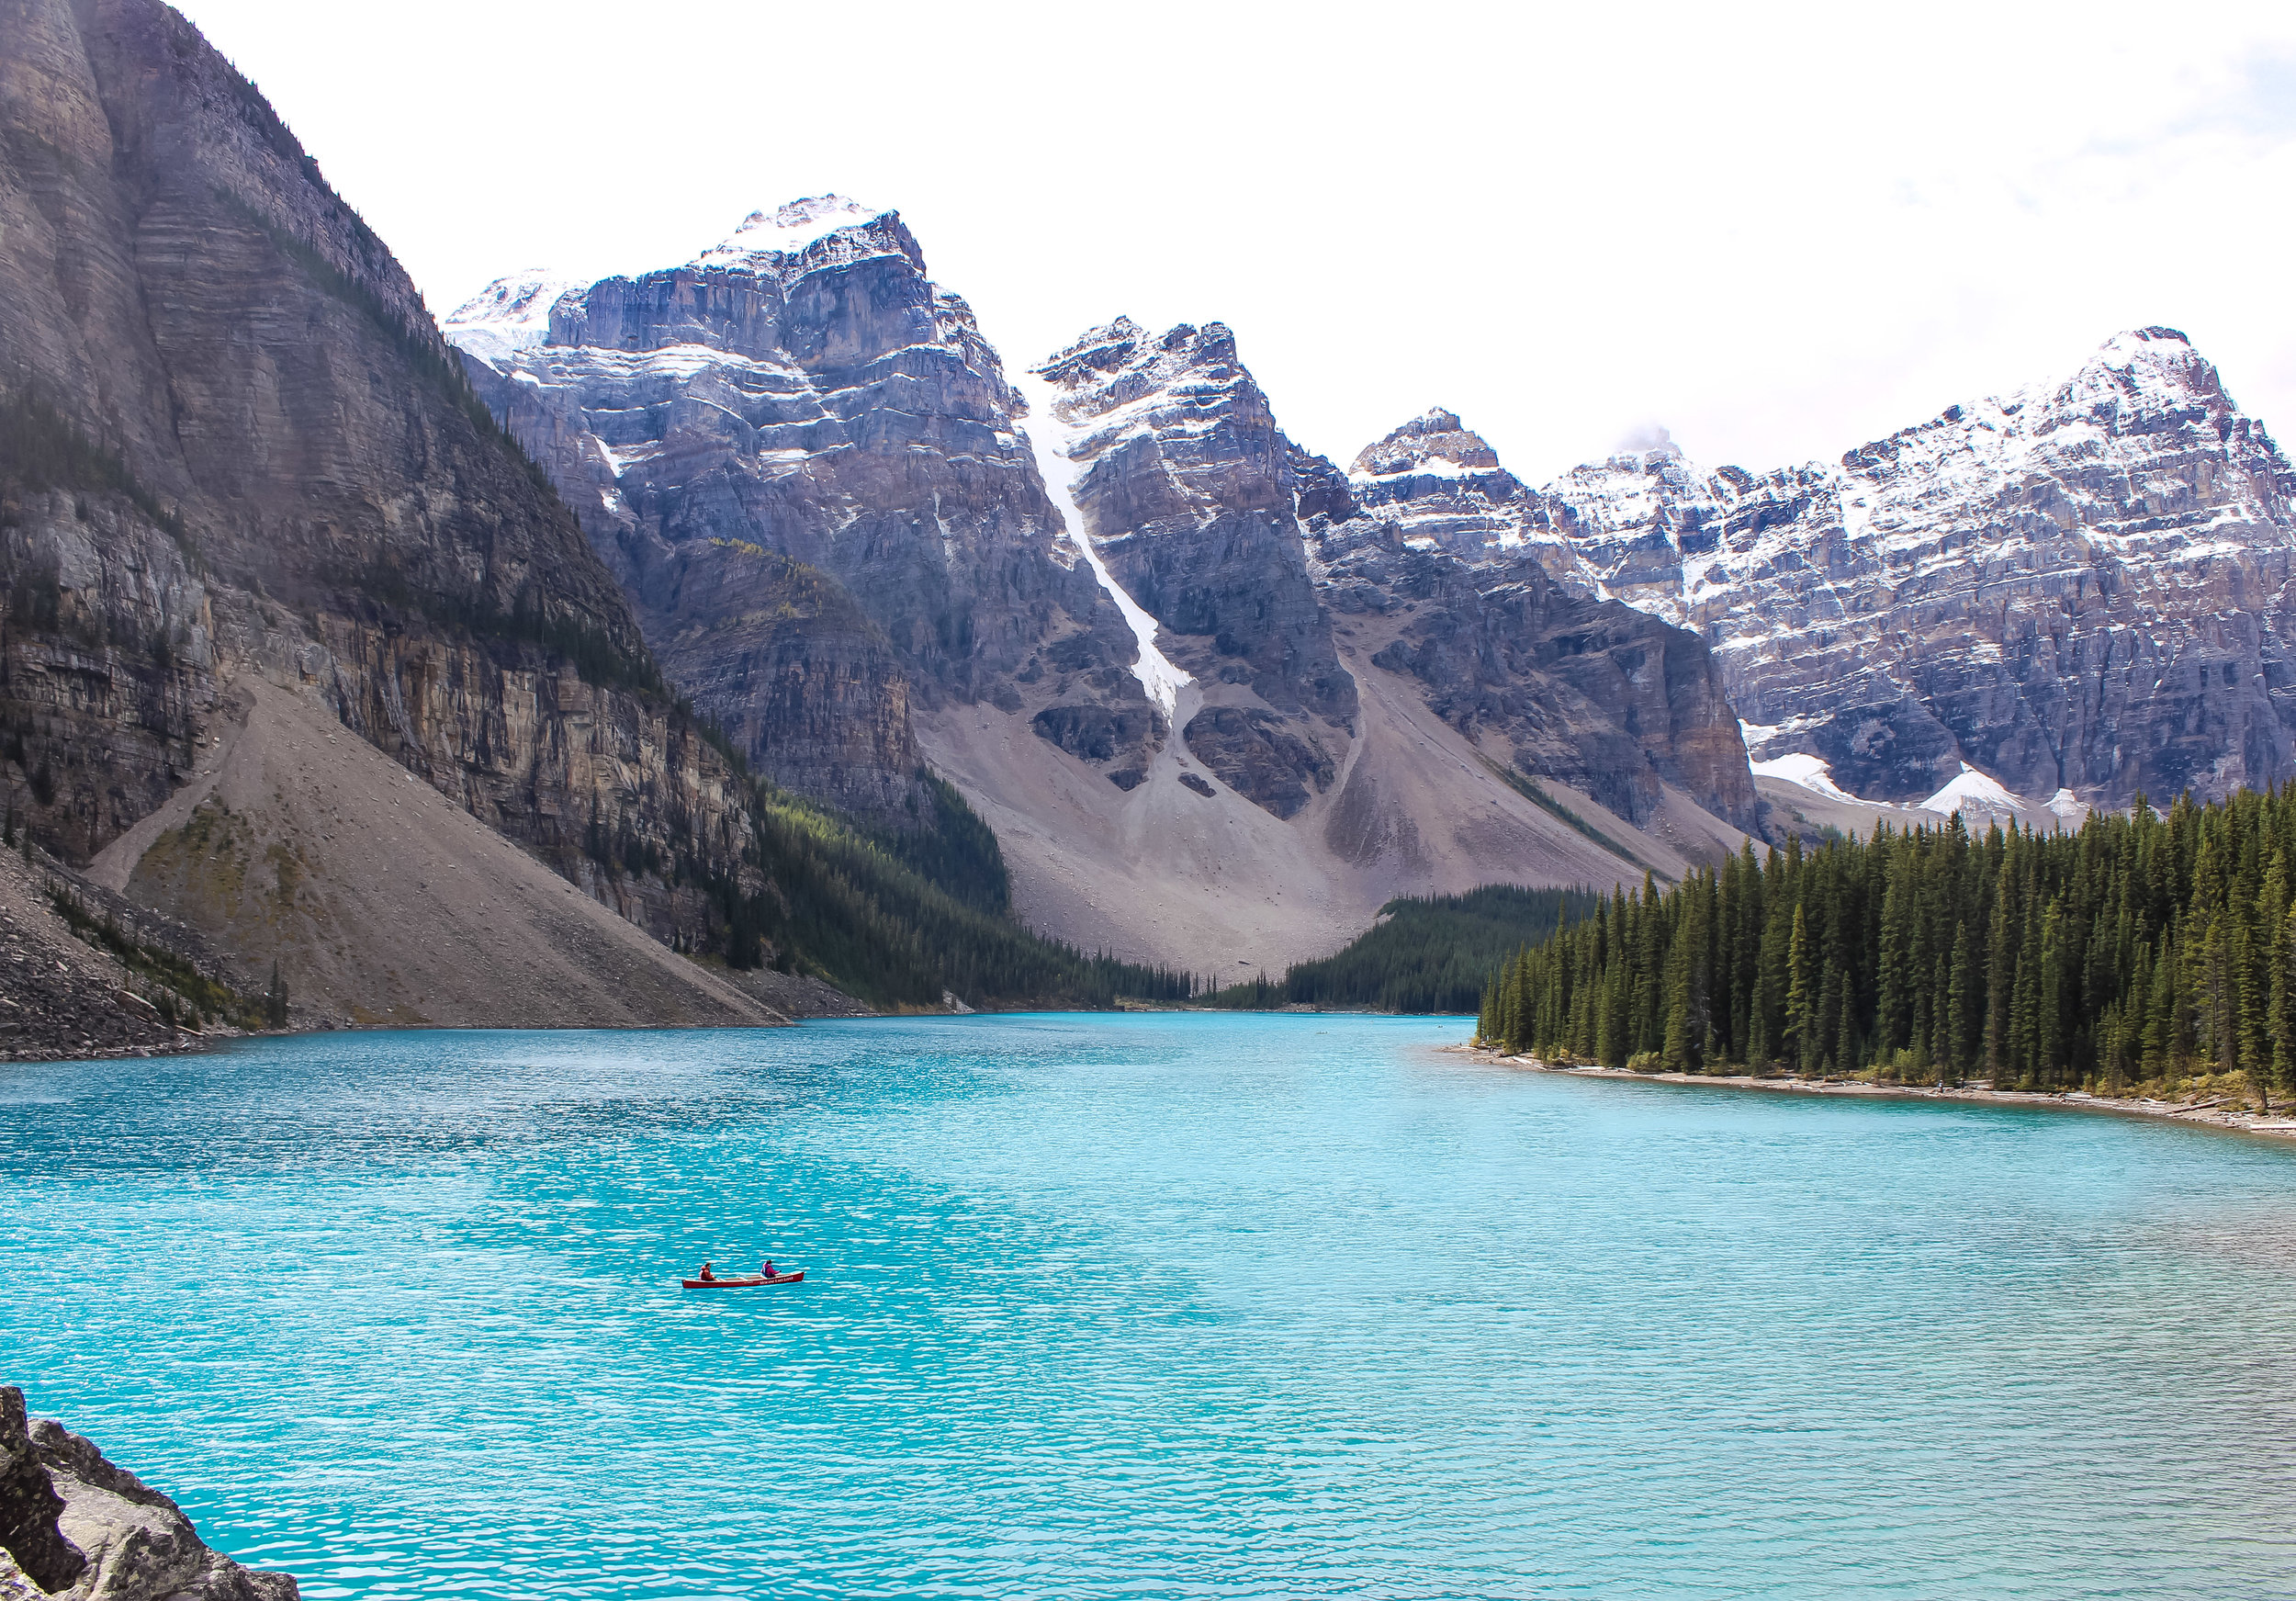 curio.trips.canada.banff.np.moraine.lake.canoe.landscape.jpg